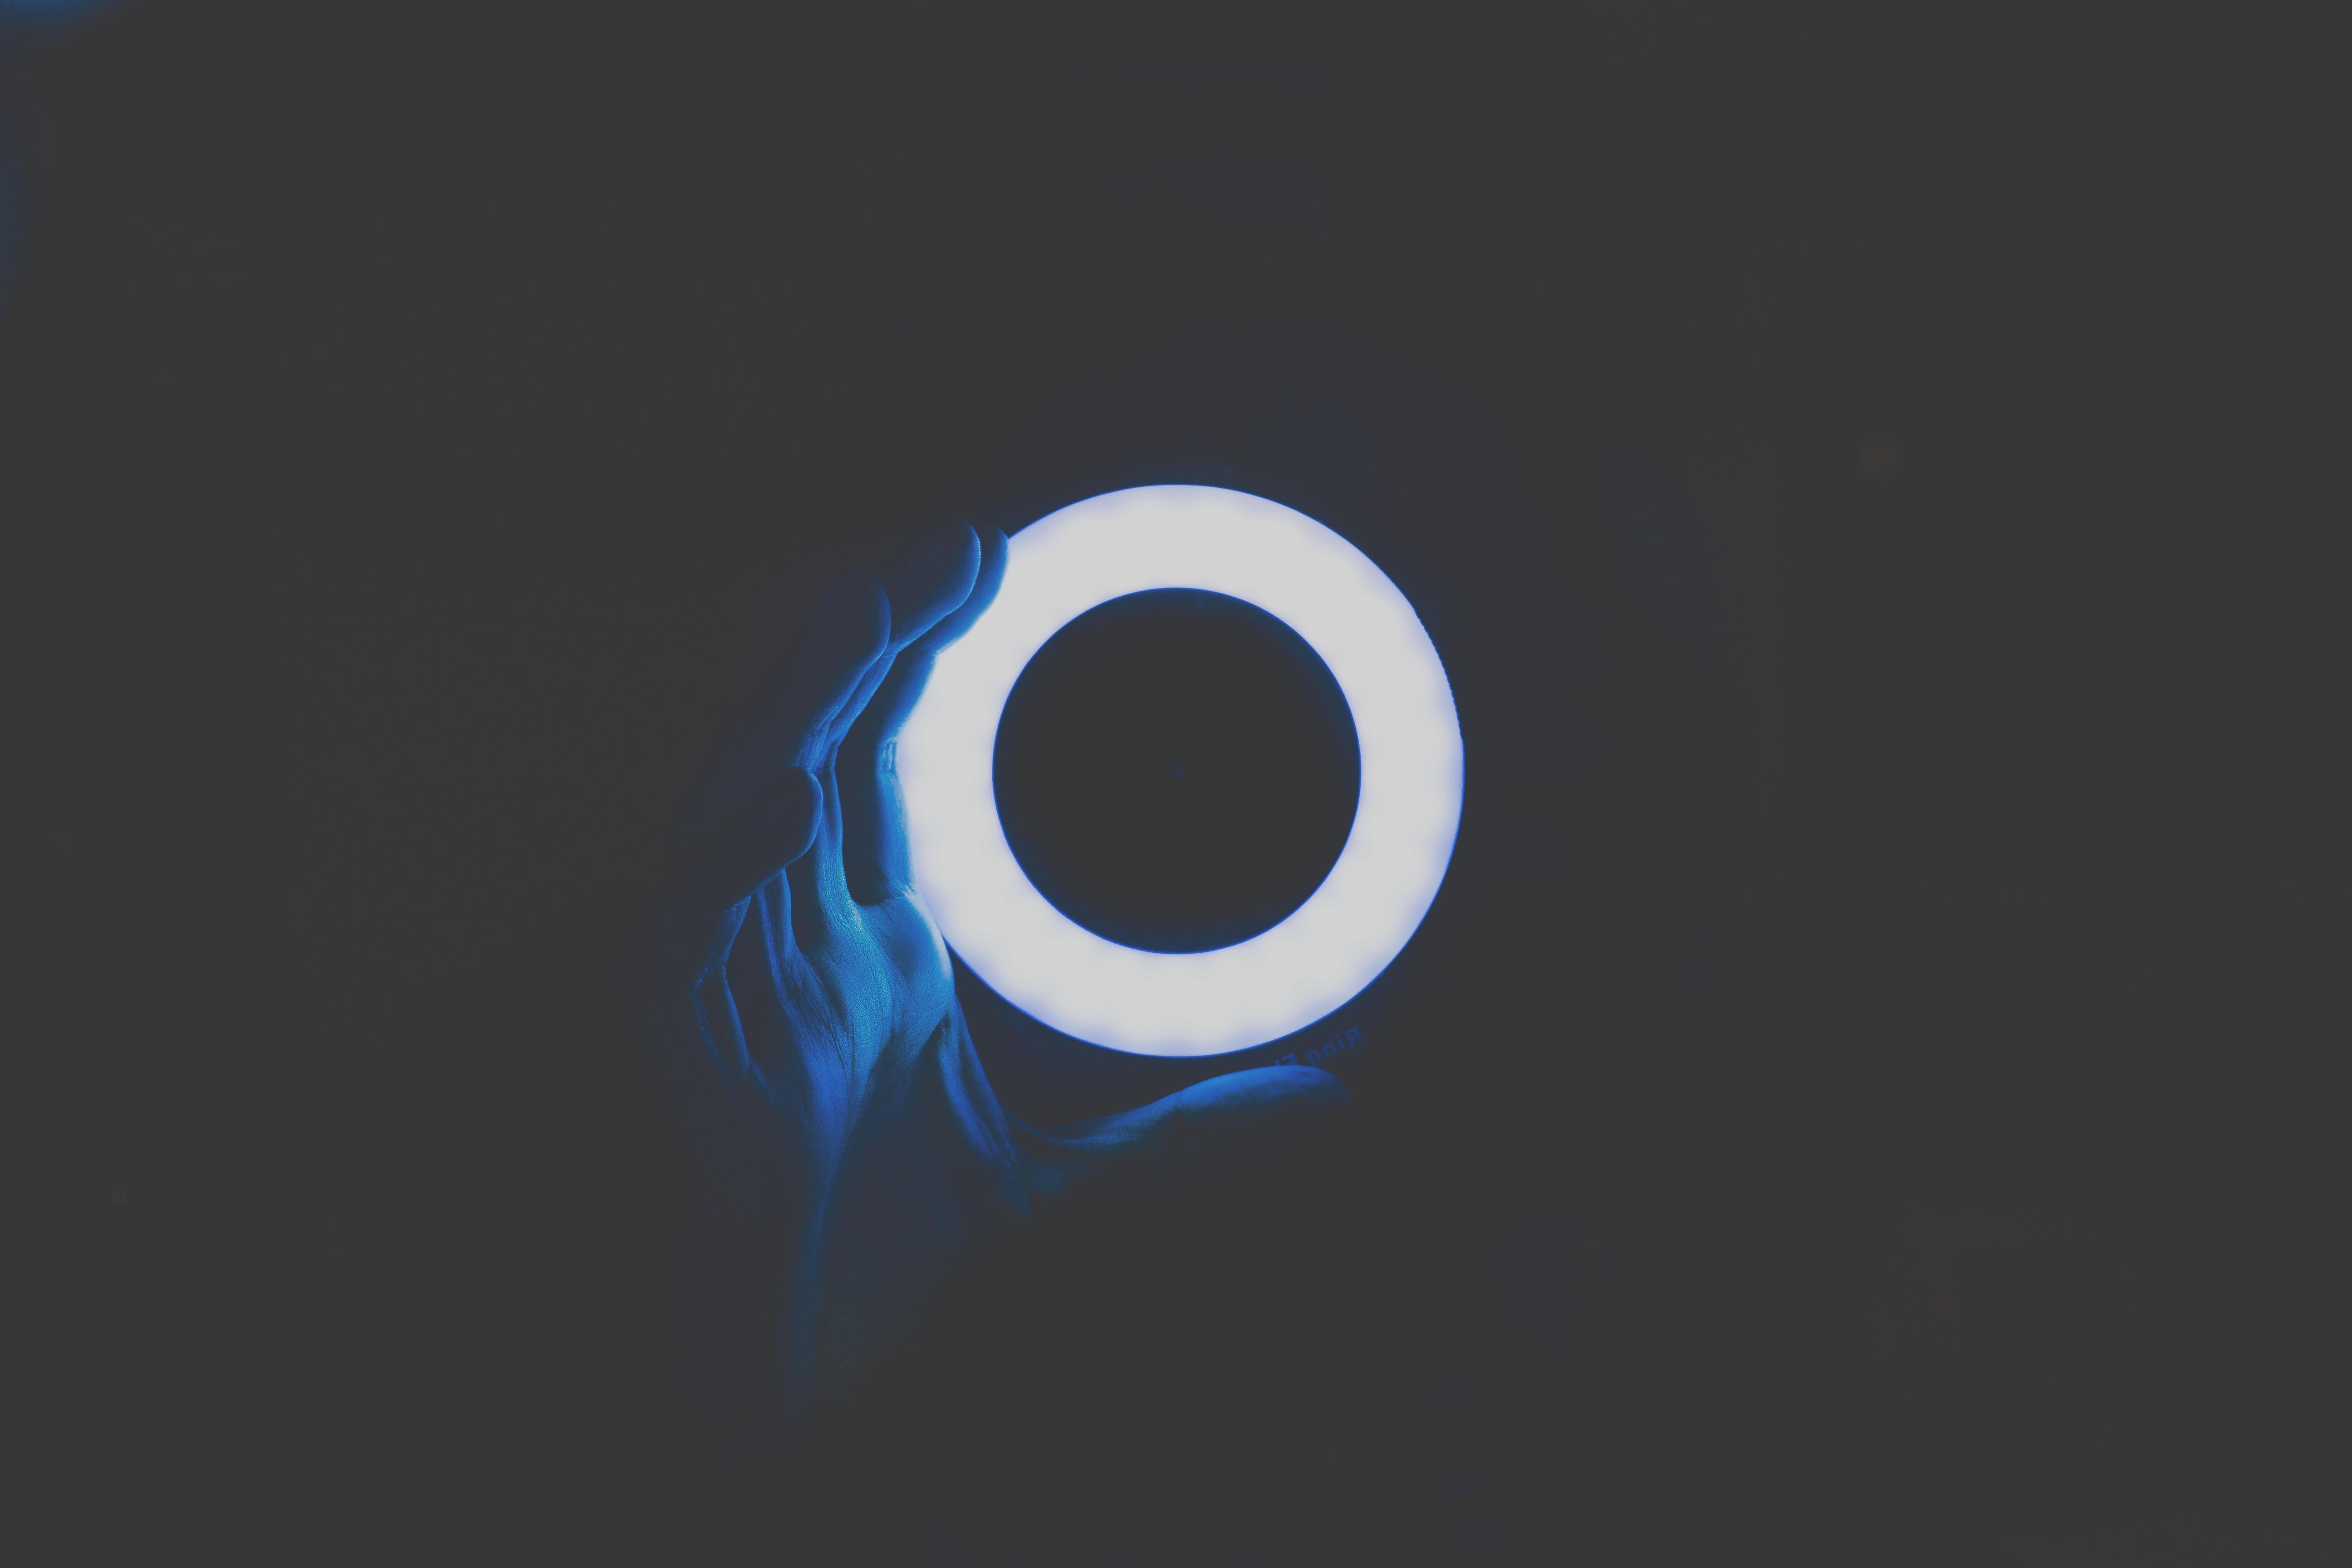 A ring lamp illuminates a hand in the dark.